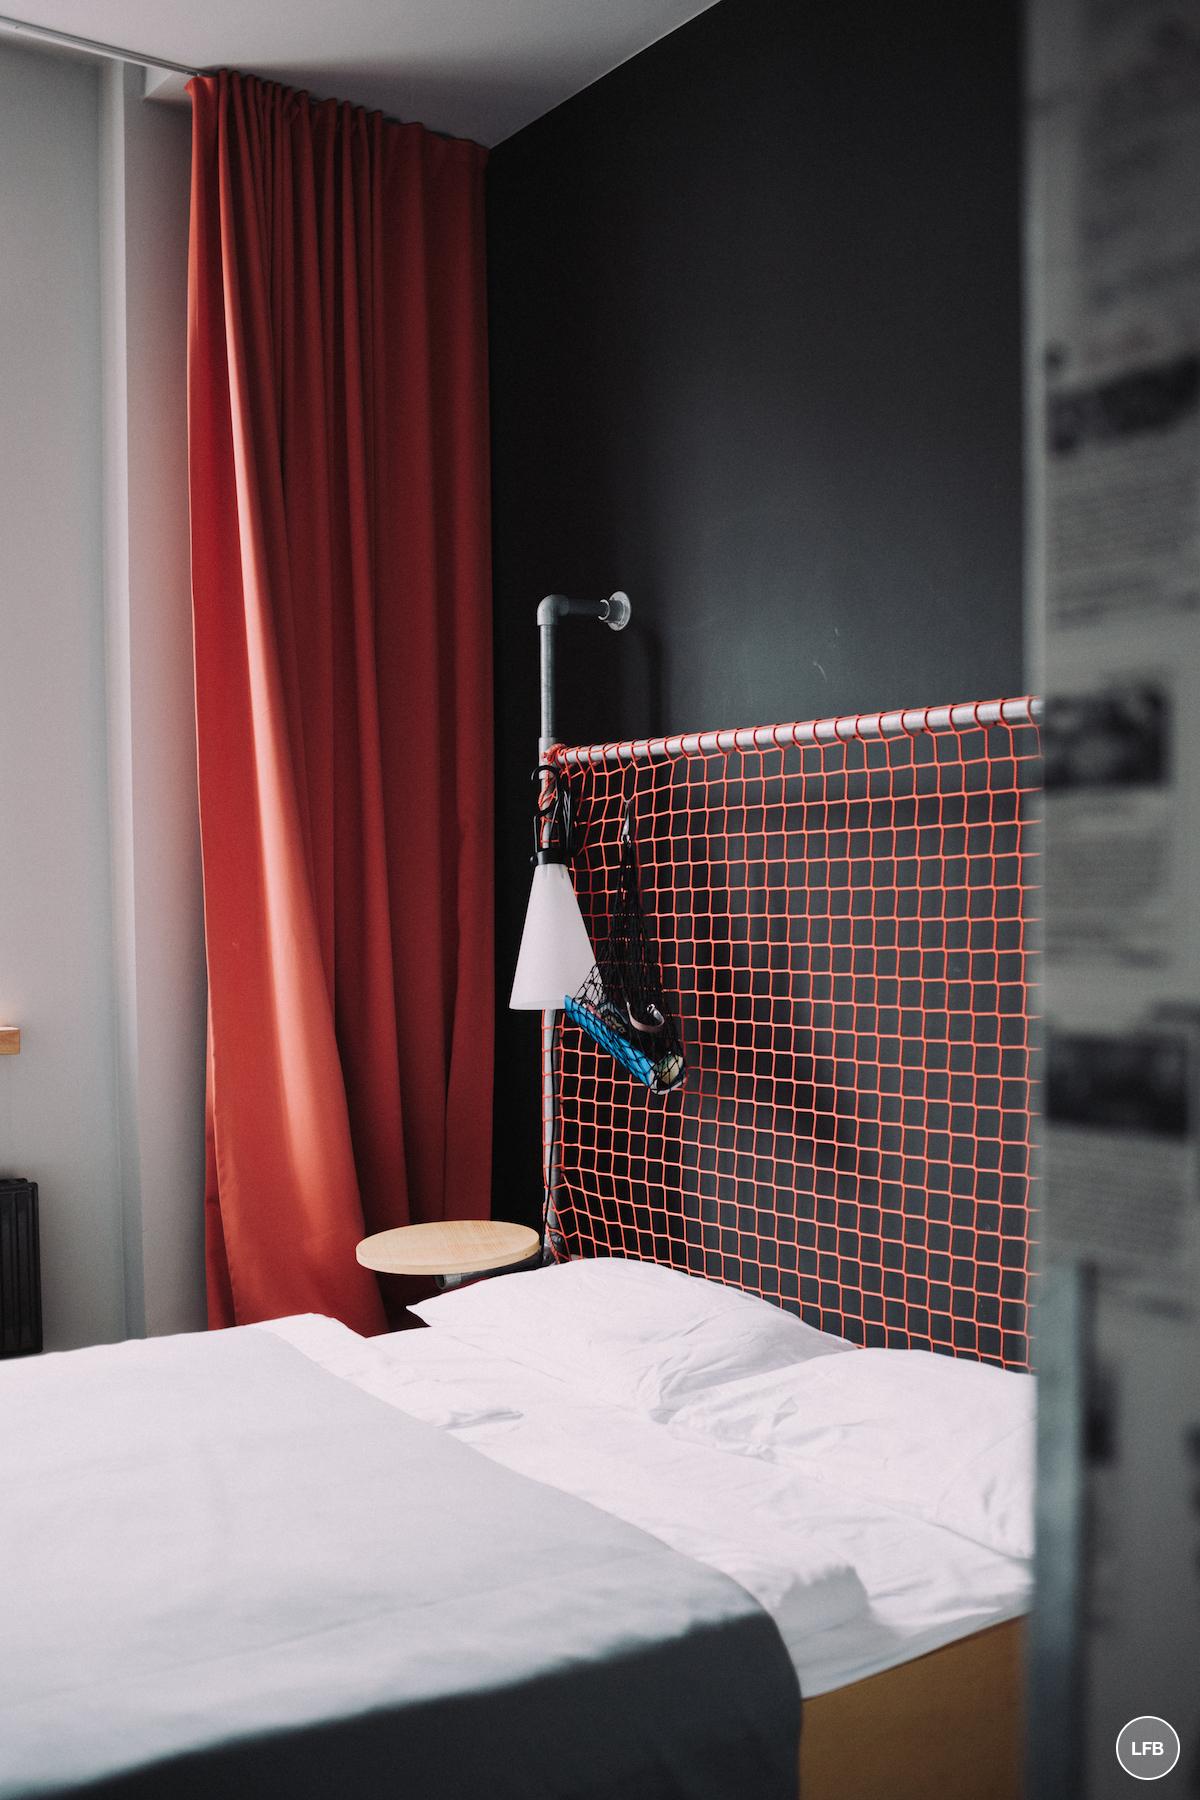 Superbude Hotel - photogrphy: Rae Tashman - lovefromberlin.net